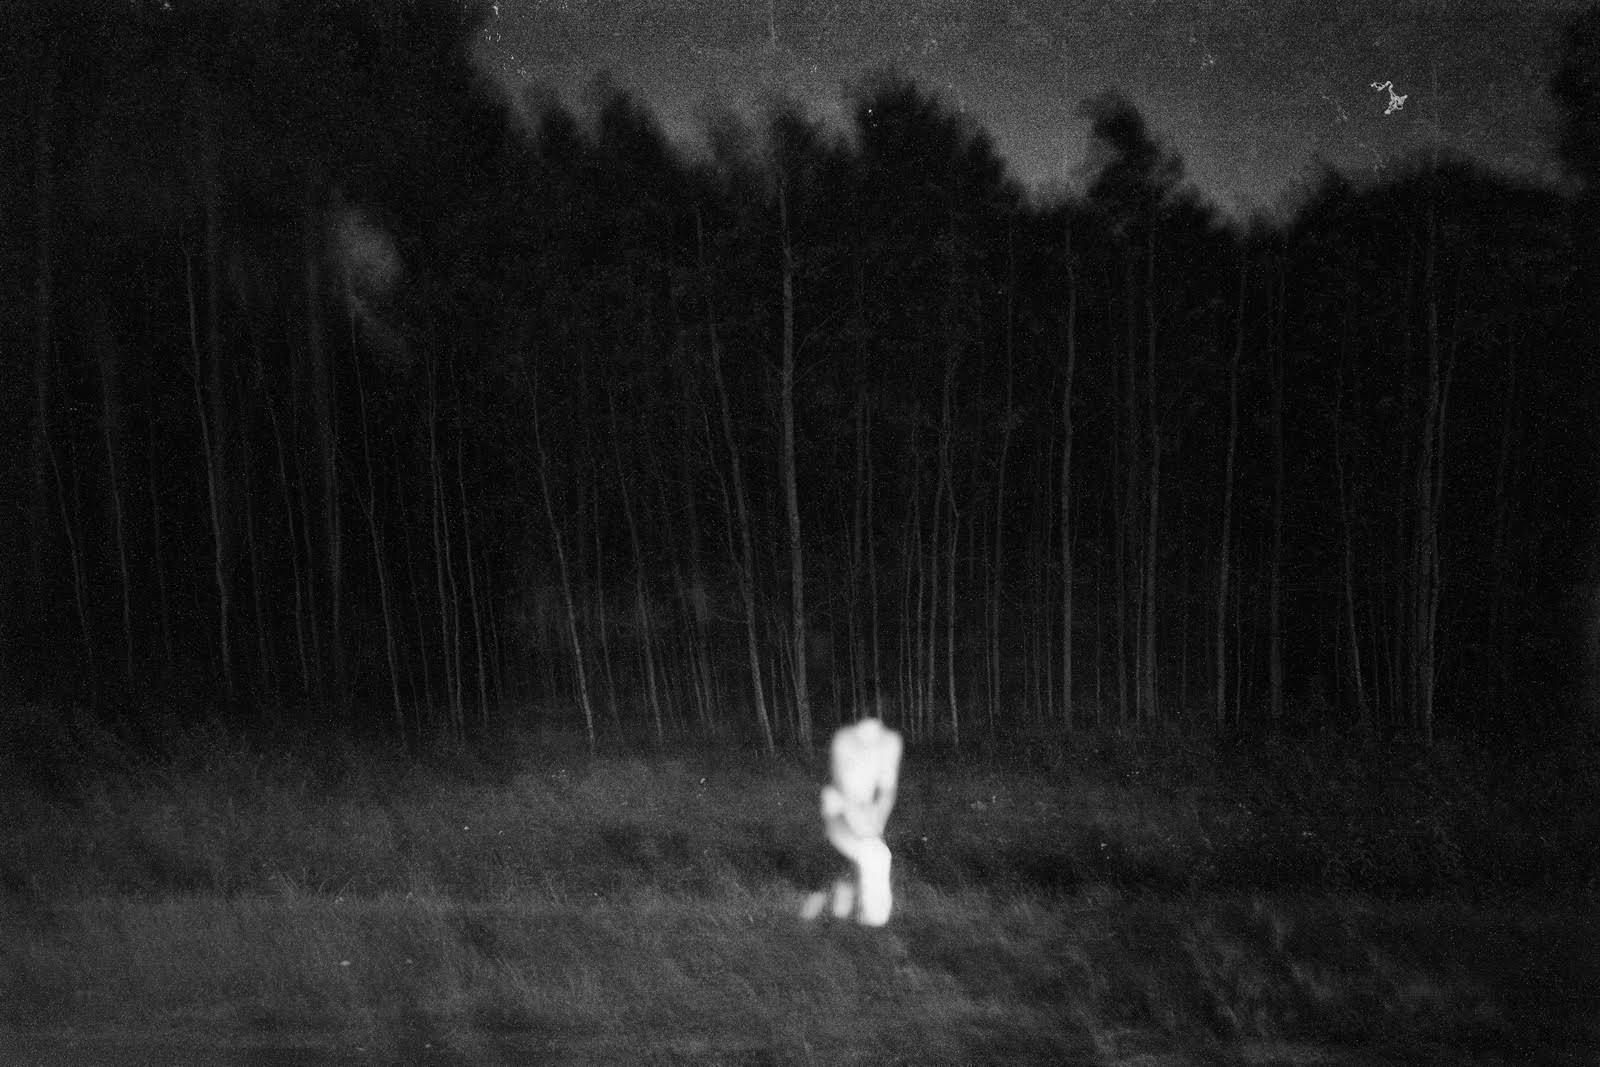 Fundamental space explorations of naked singulari_Sergey-Melnitchenko_Yogurt- Magazine3